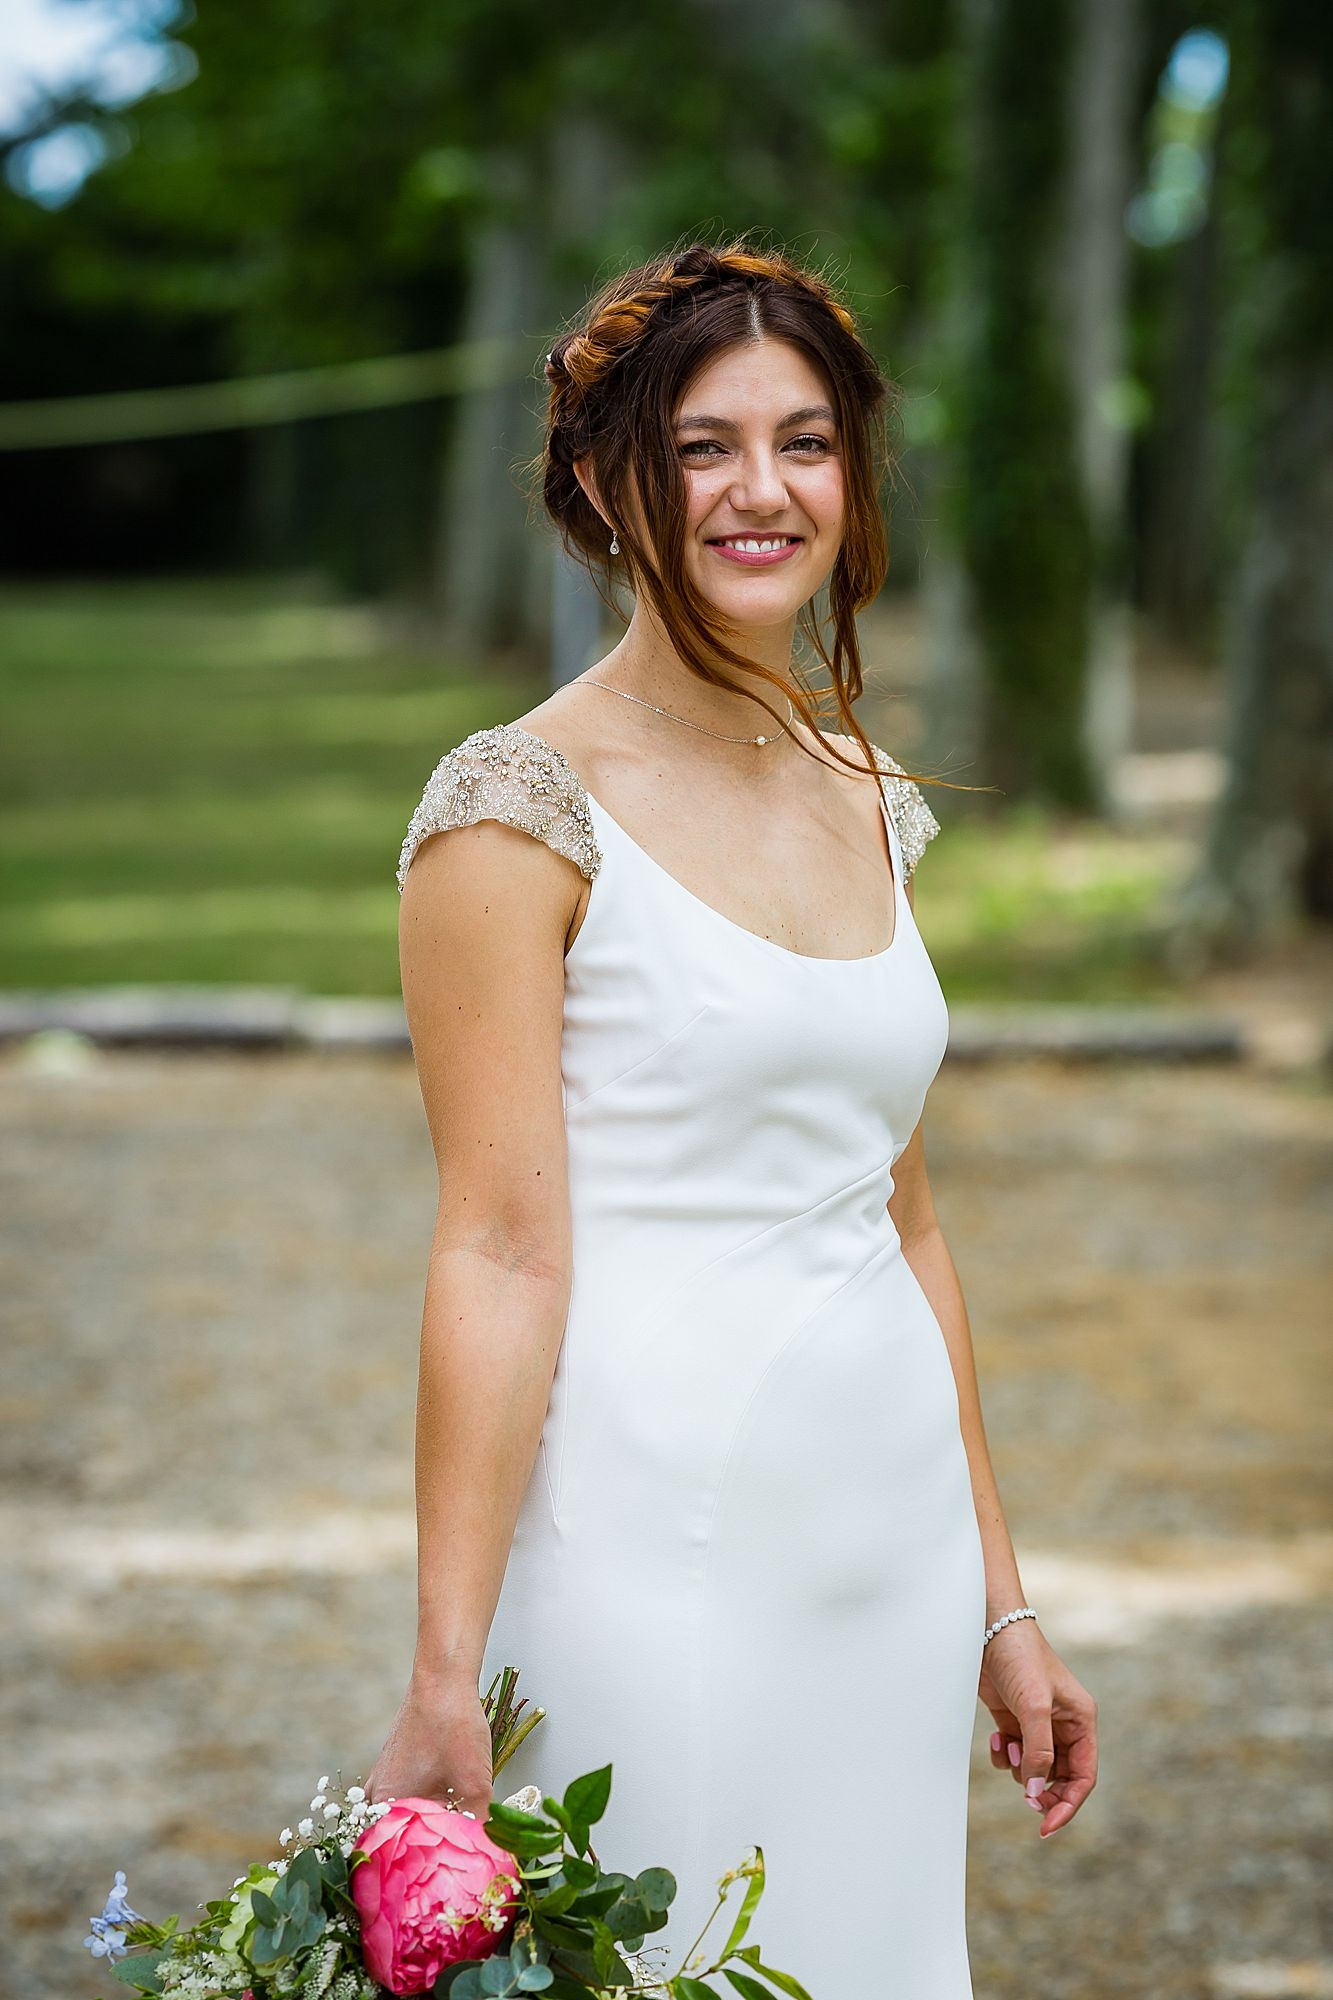 boho bride at Chateau Rieutort wedding